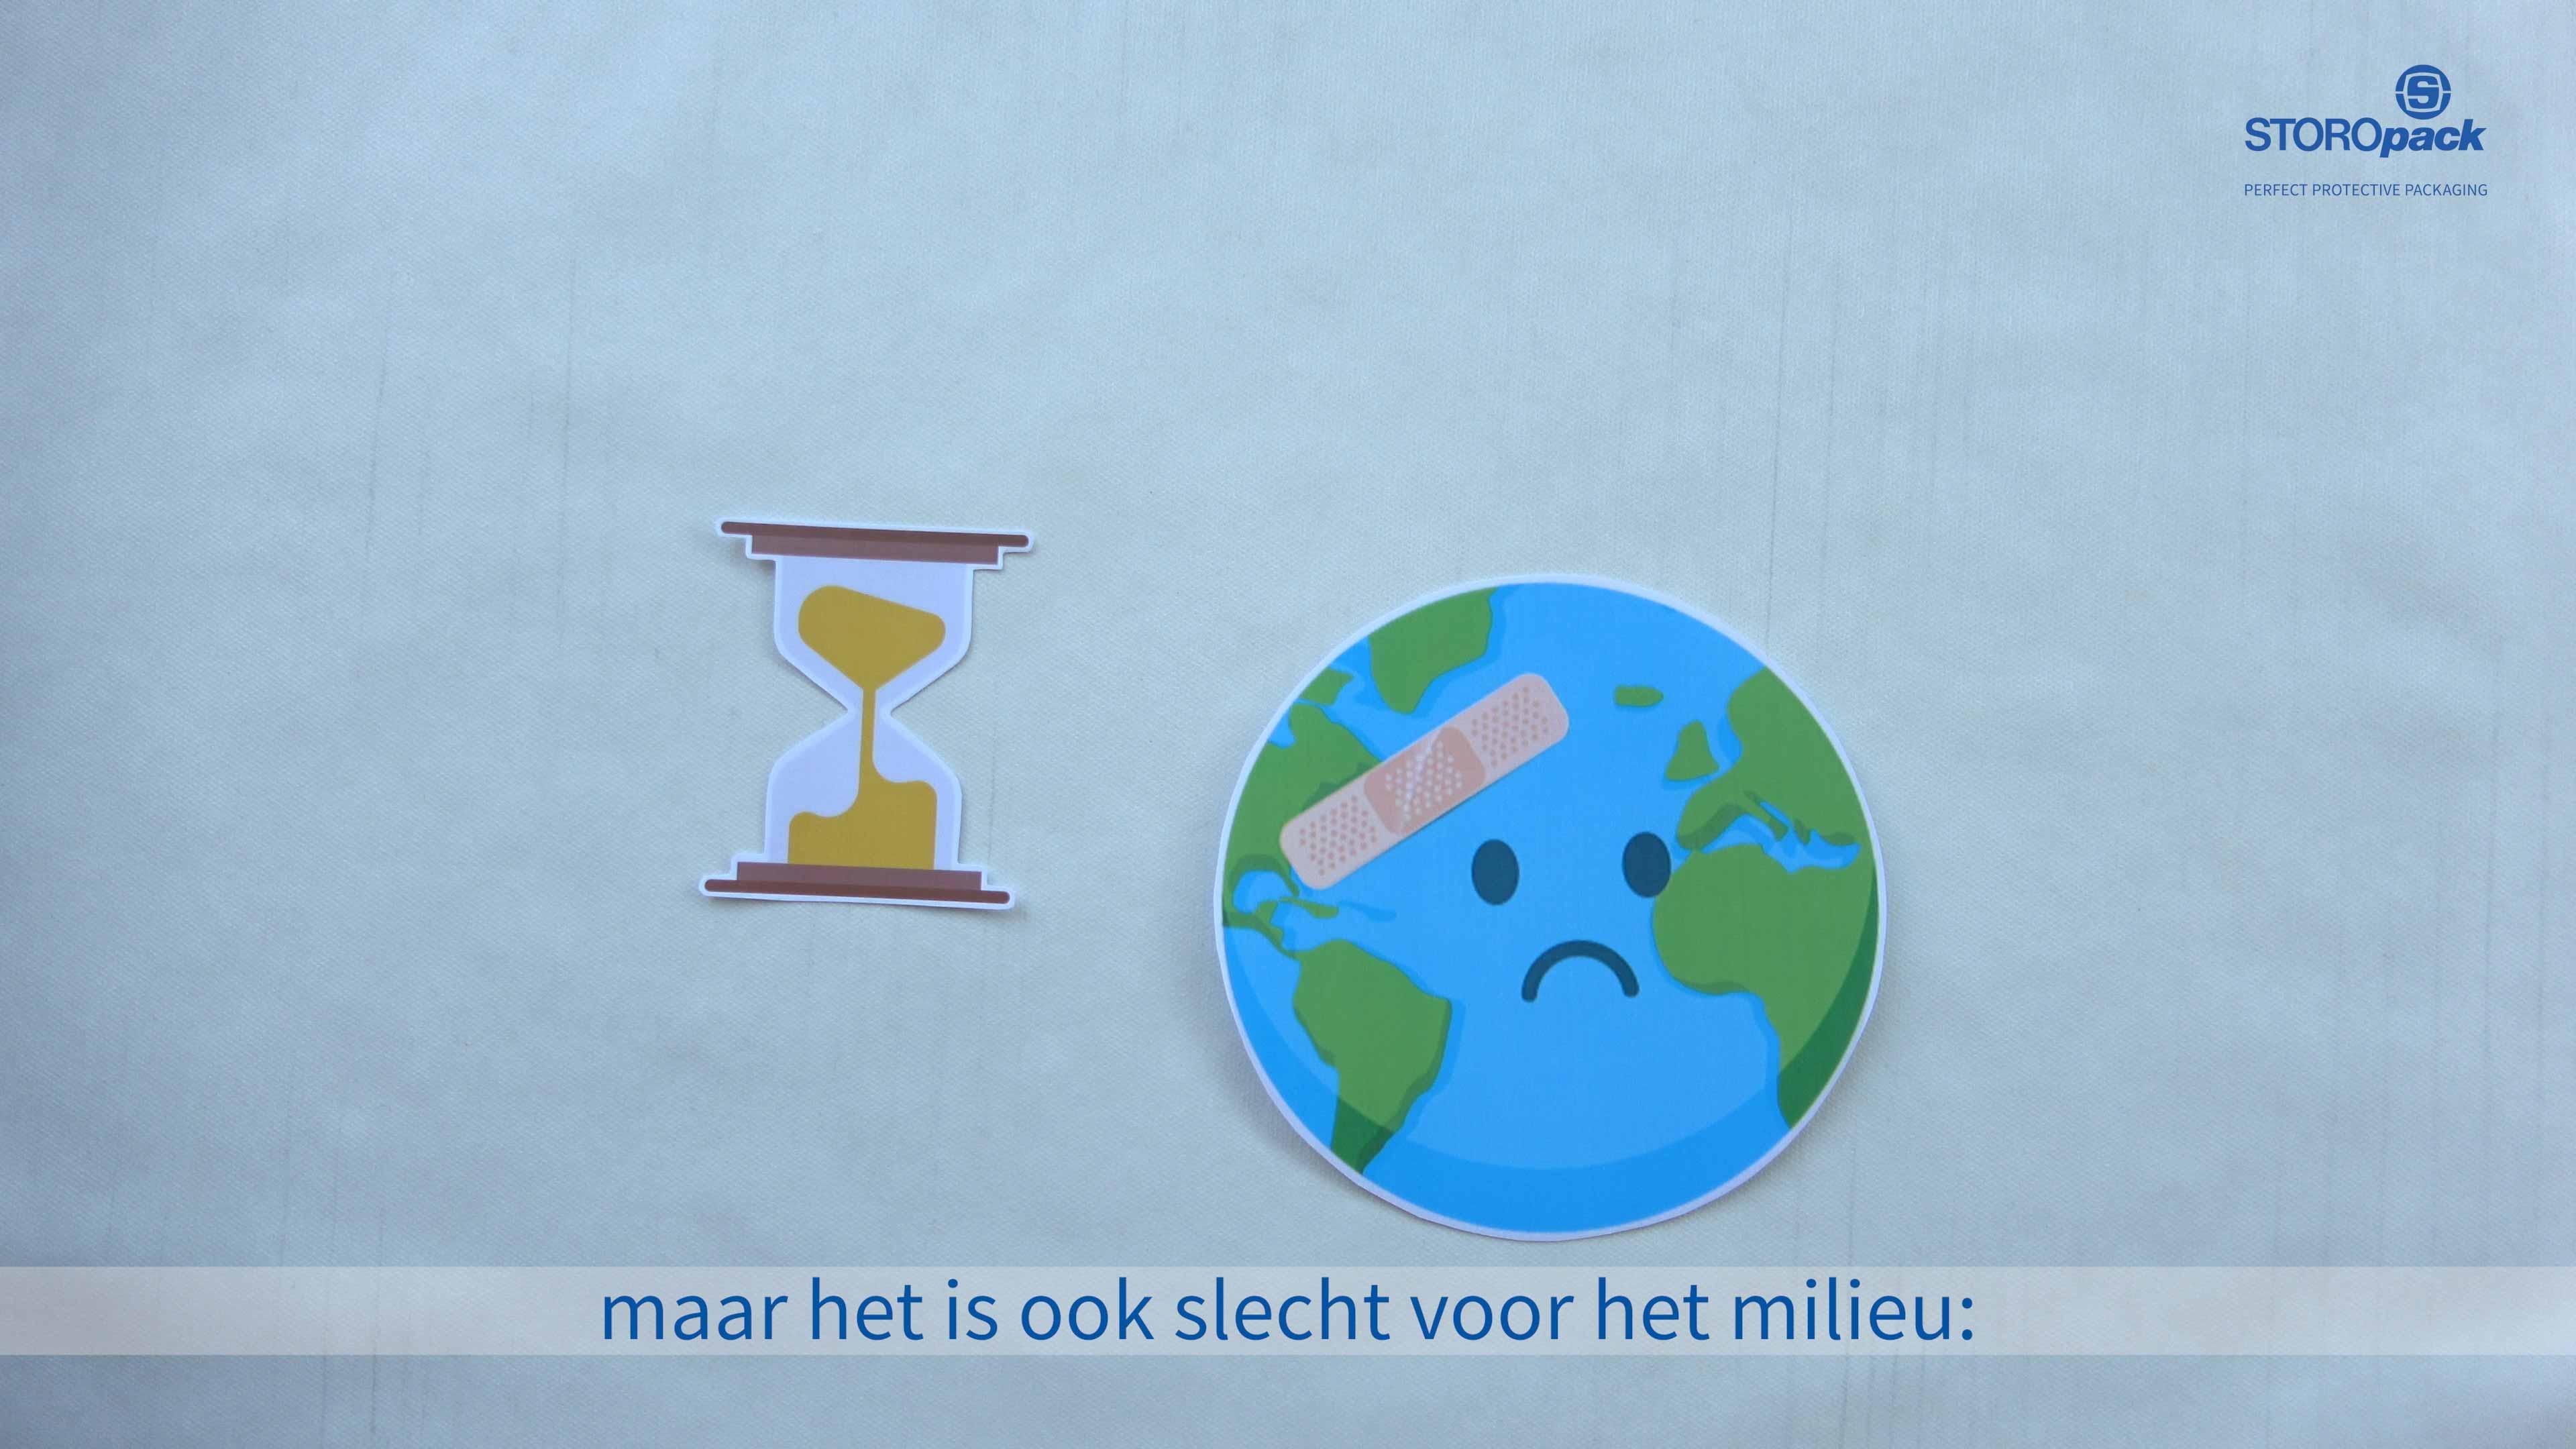 Cut-out-Video NL_Environment_small.jpg